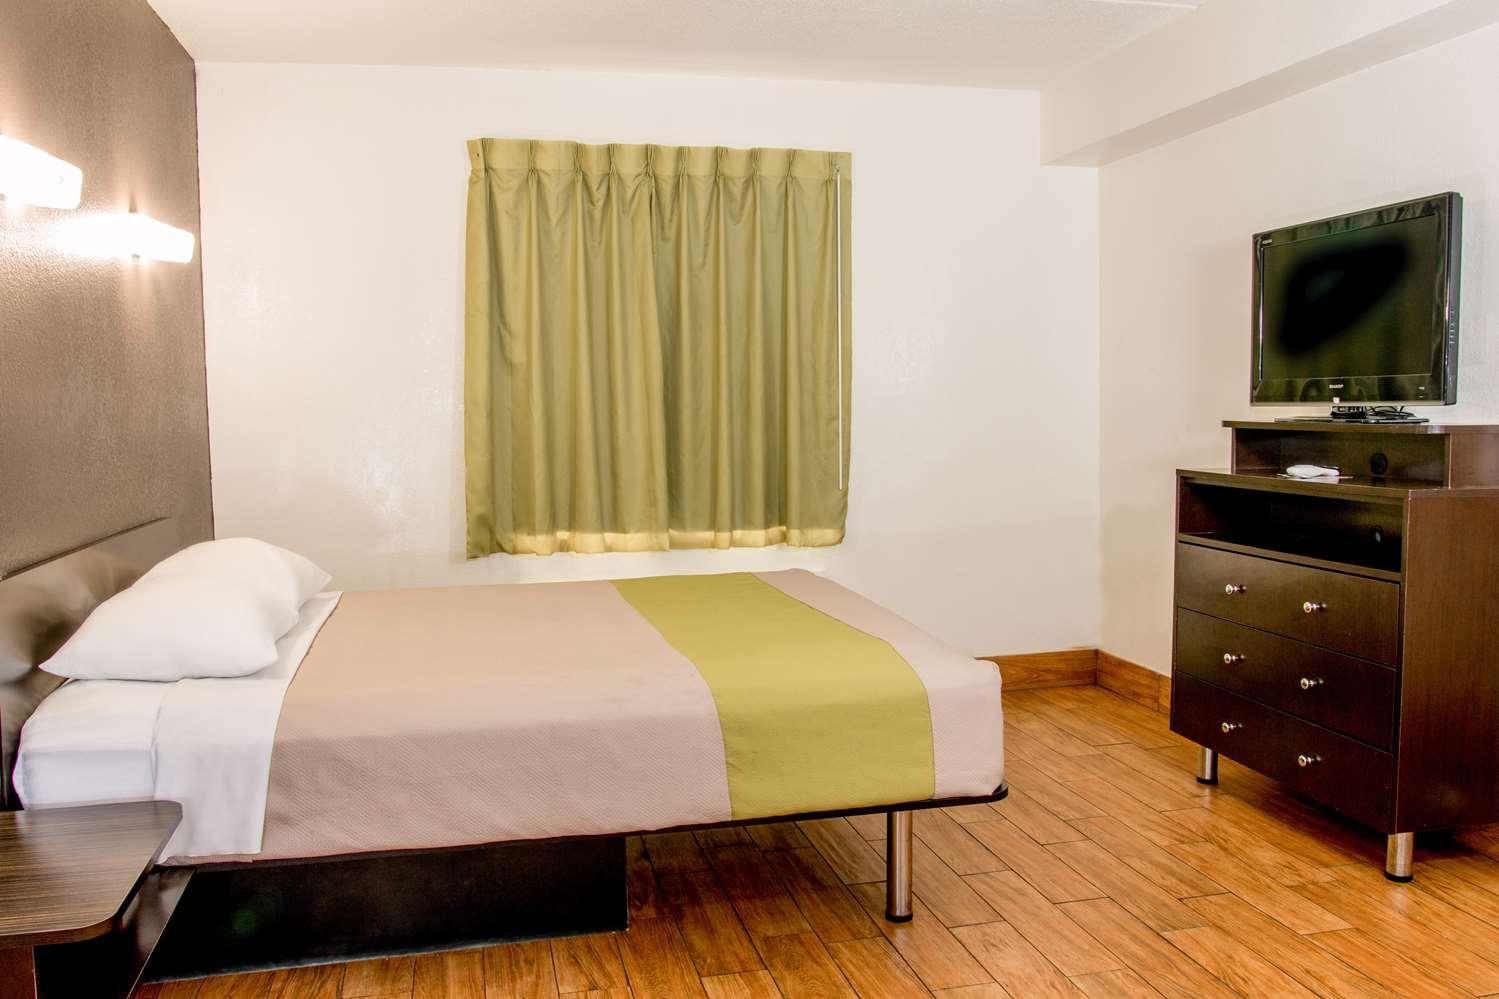 Studio 6 Extended Stay Hotel Lackland San Antonio Tx